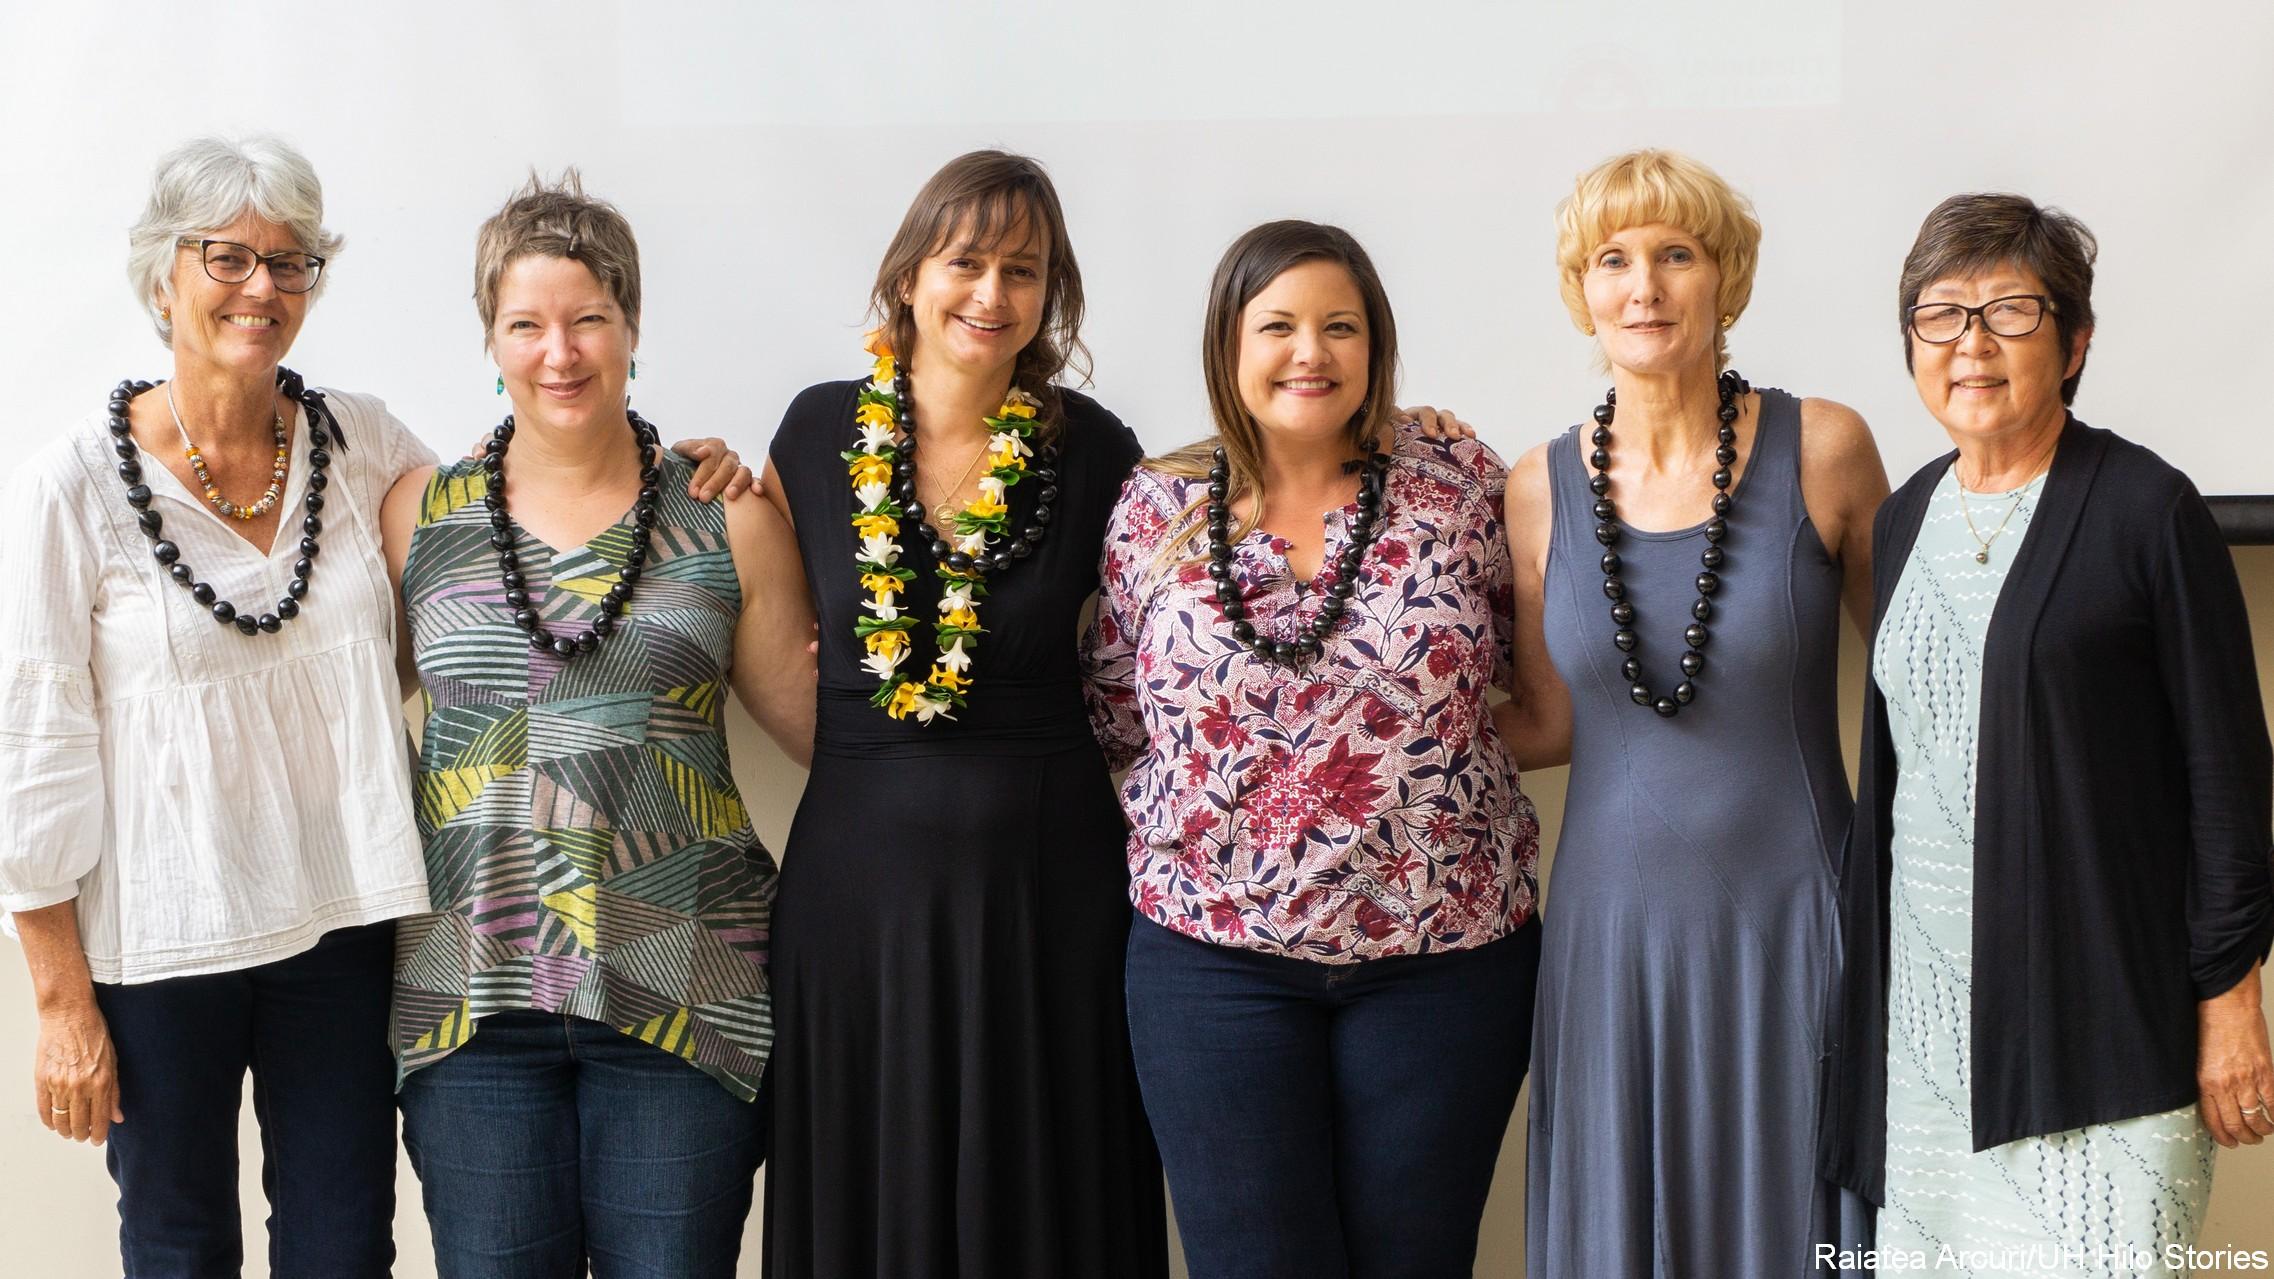 Group of faculty with chancellor: Kirsten Møllegaard, Sarah Marusik, Marina Karides, Charmaine Higa-McMillan, Faith Mishina. and Marcia Sakai.